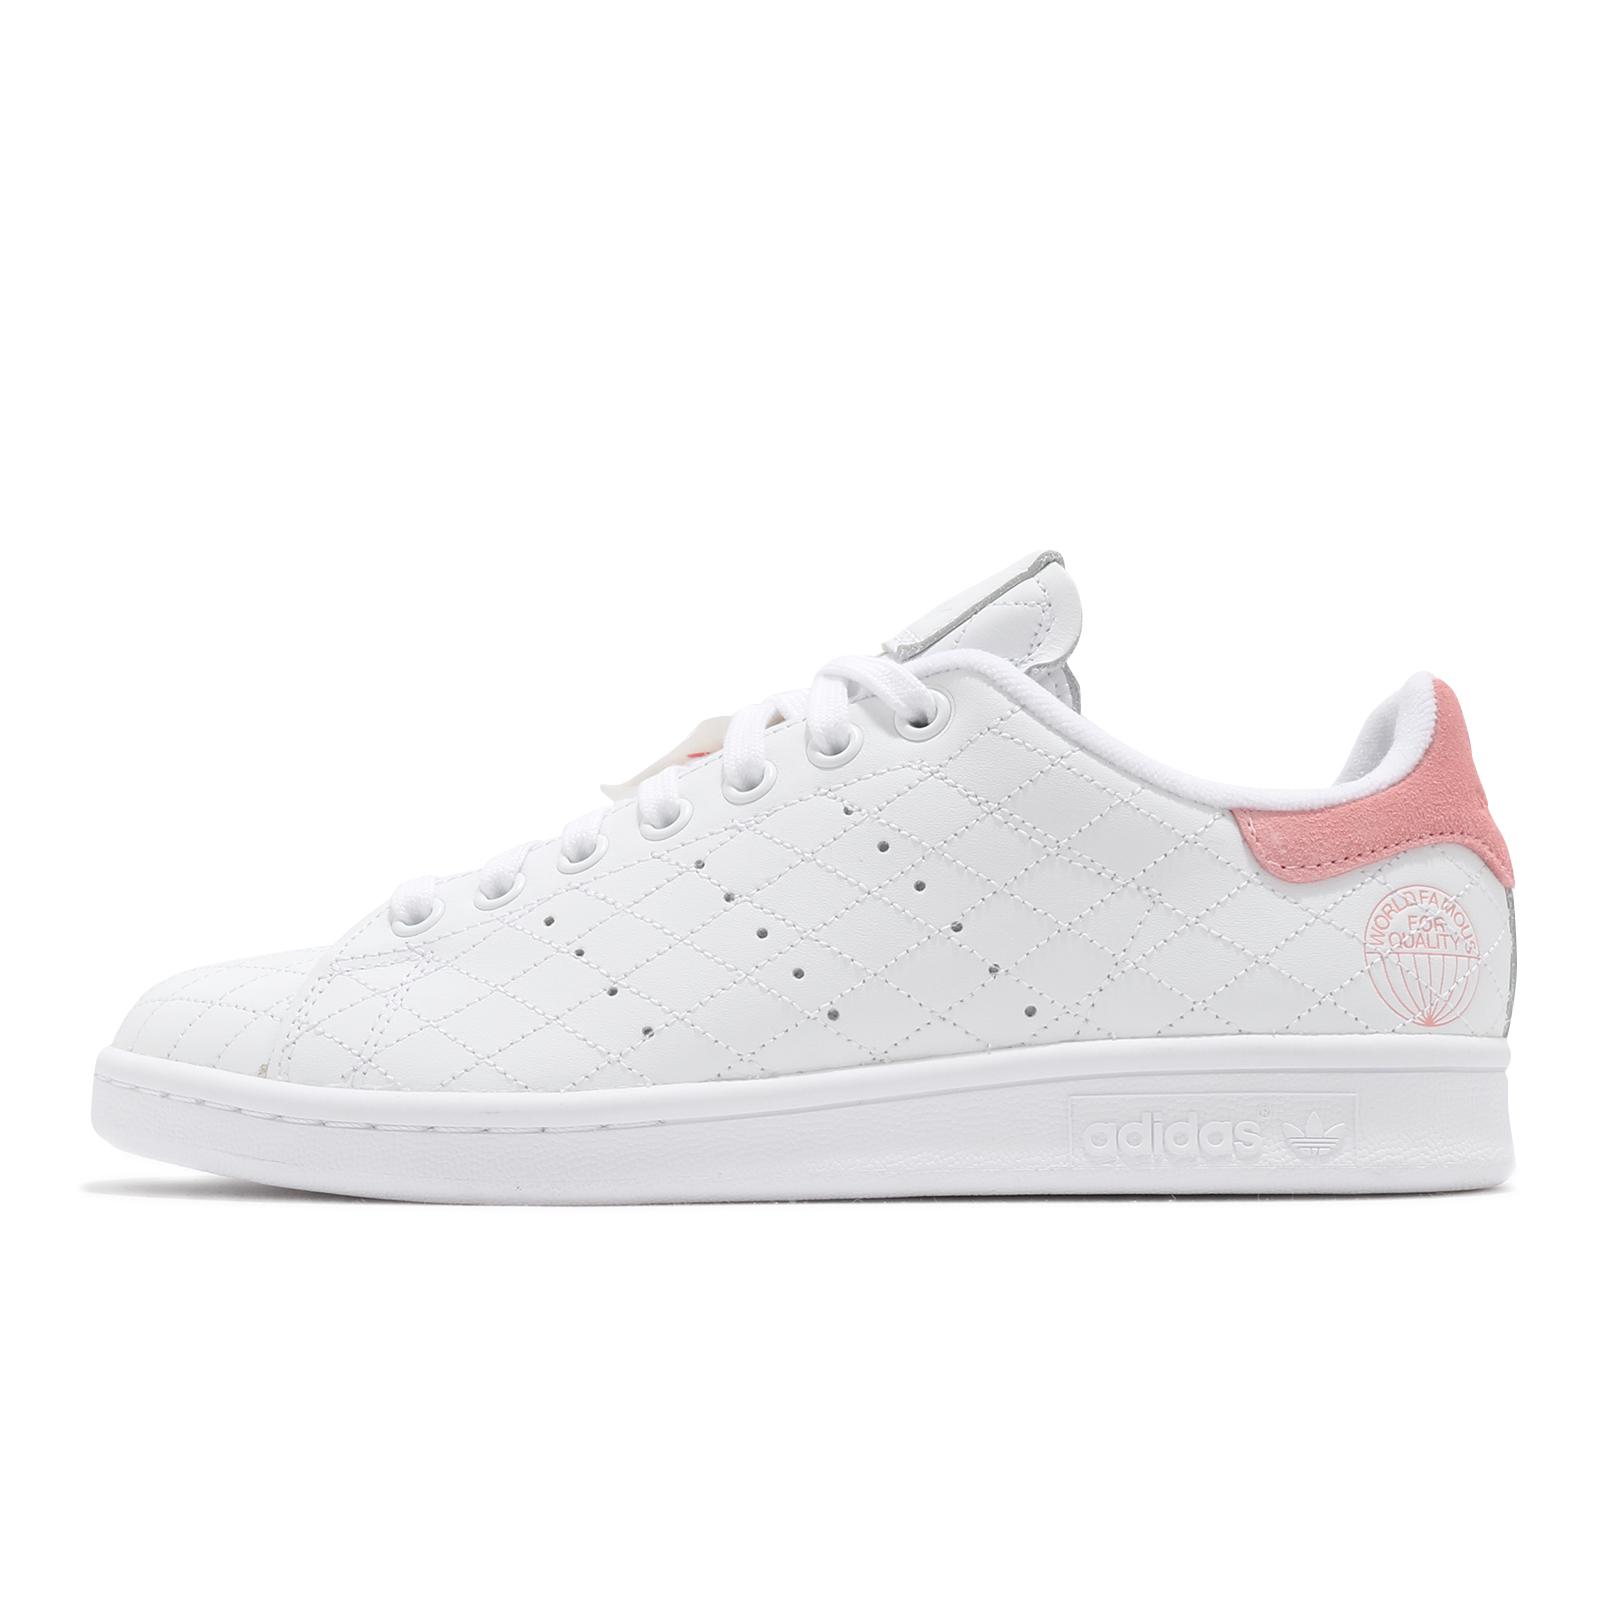 adidas 休閒鞋 Stan Smith W 白 粉紅 小白鞋 女鞋 網格縫線鞋面 三葉草 【ACS】 FV4070